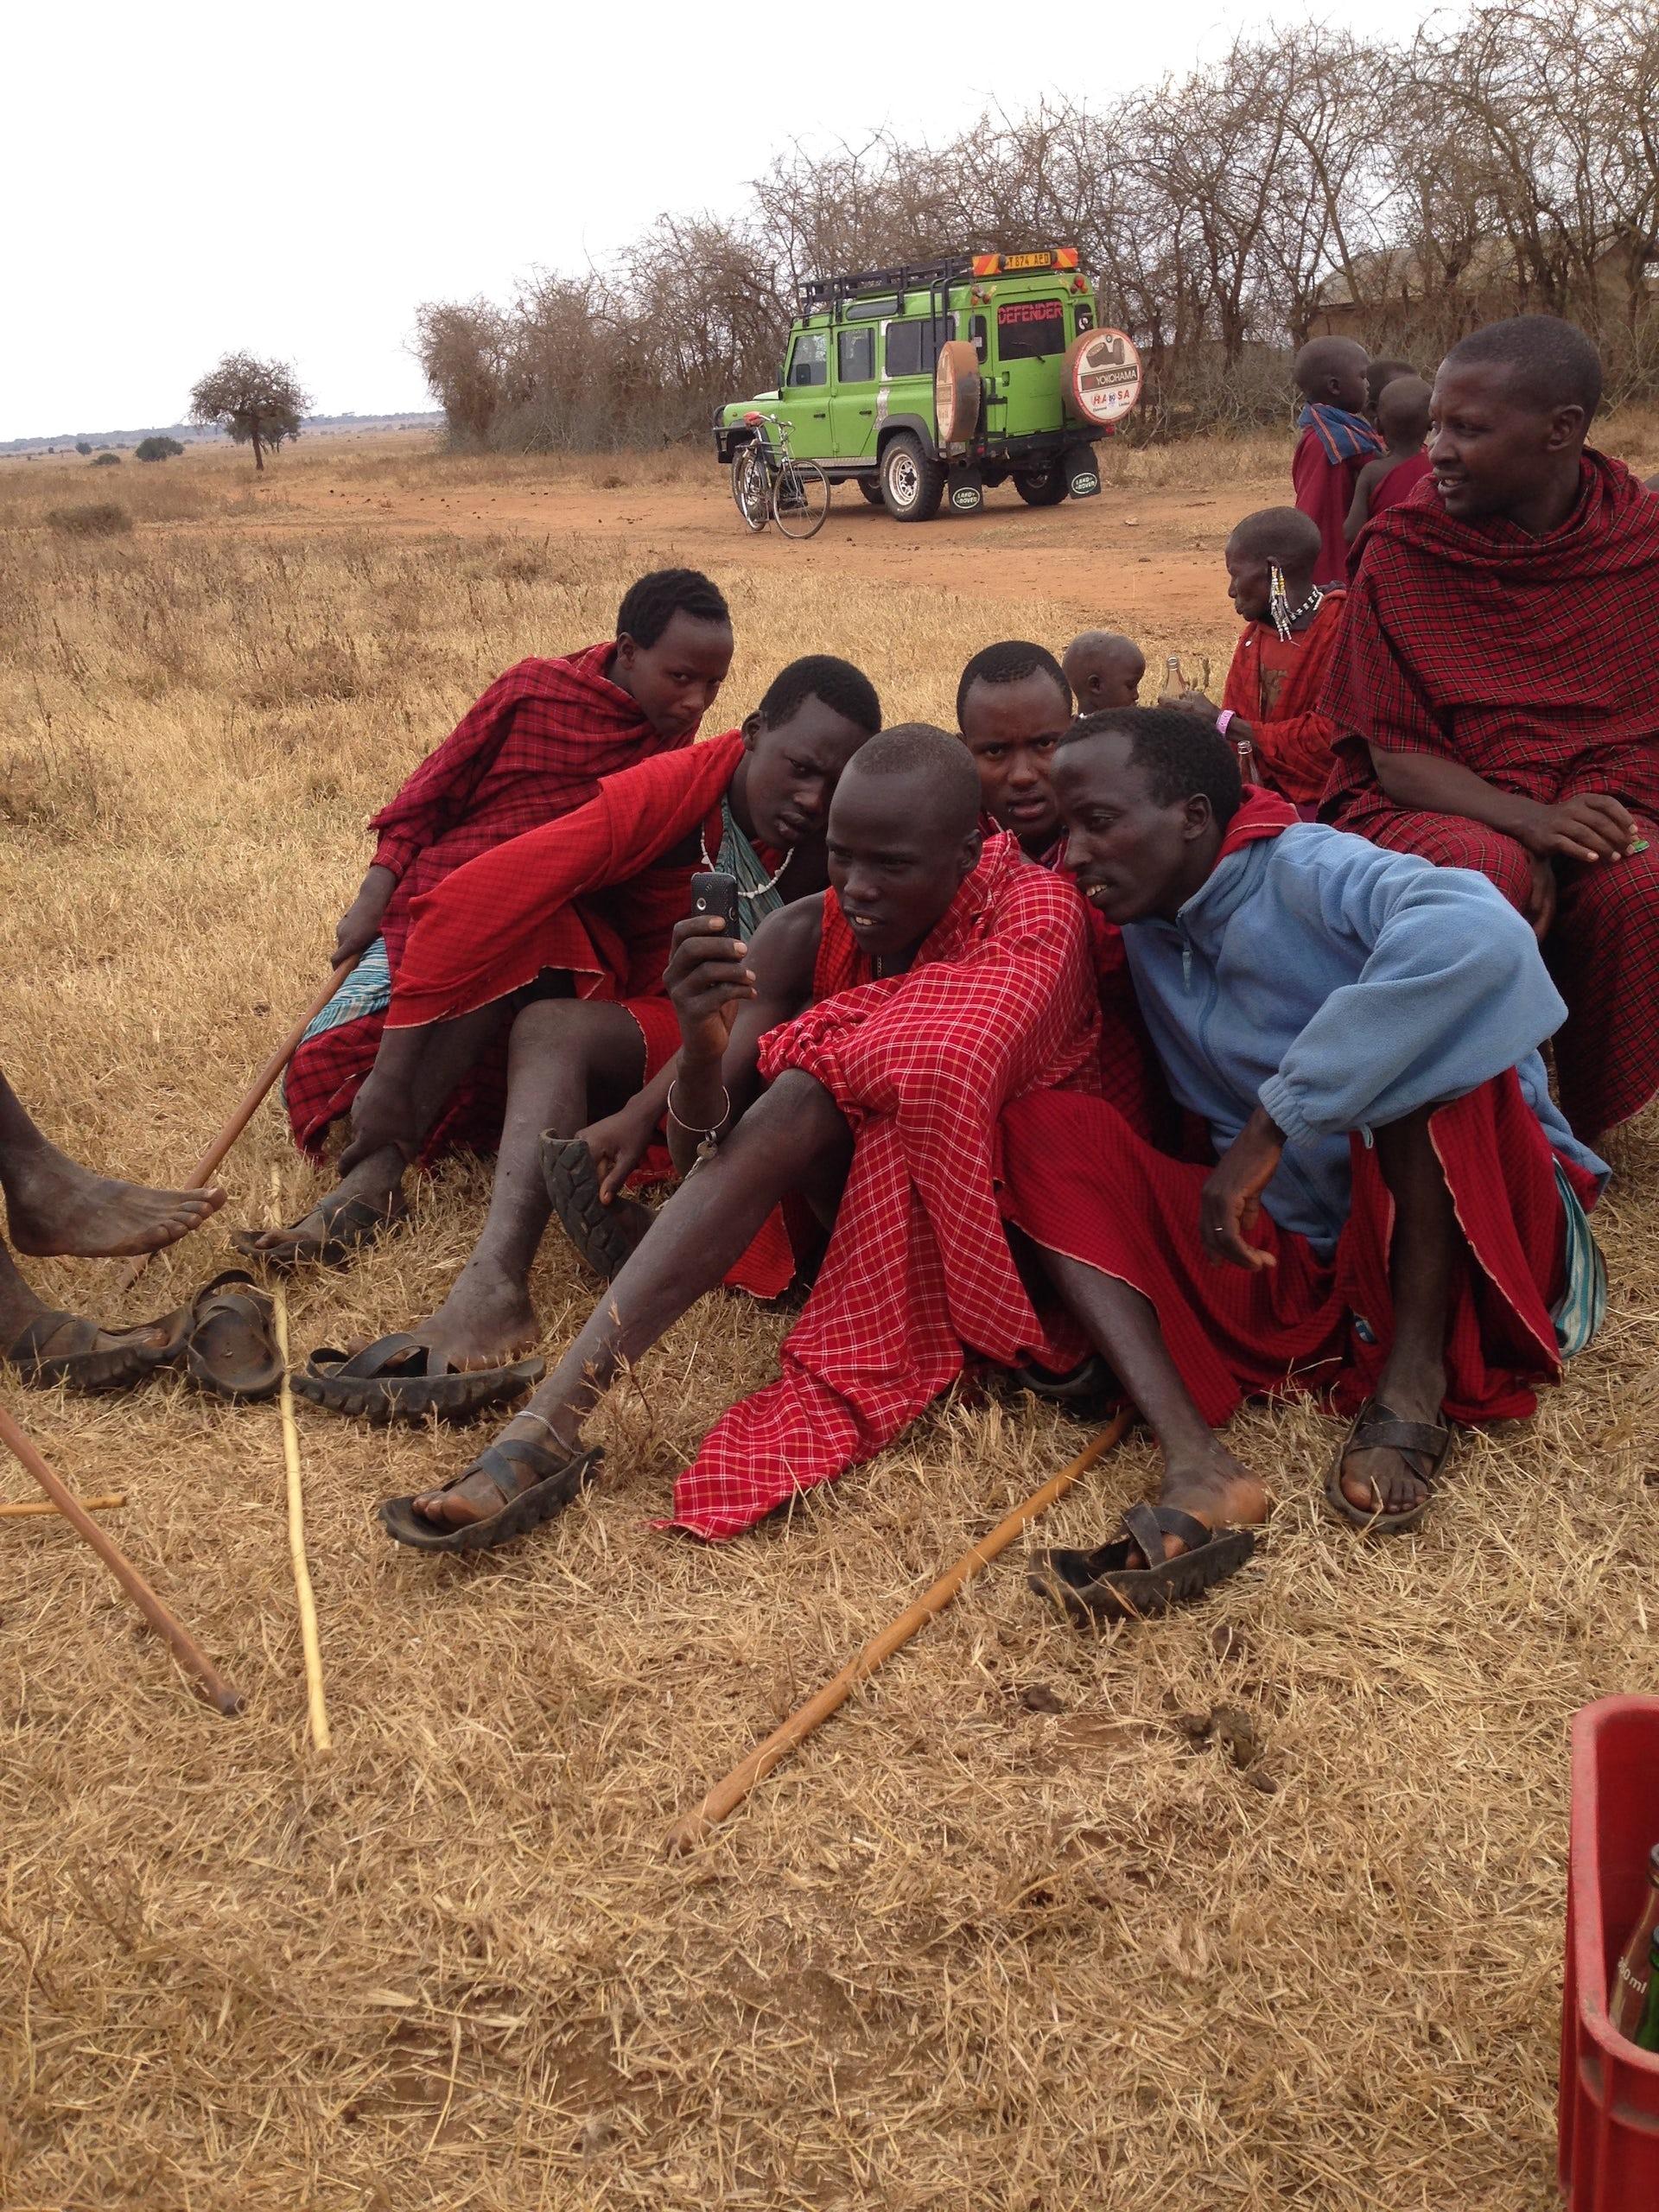 file 20170606 3668 1lns0i0.jpg?ixlib=rb 1.1 - On the savanna, mobile phones haven't transformed Maasai lives – yet